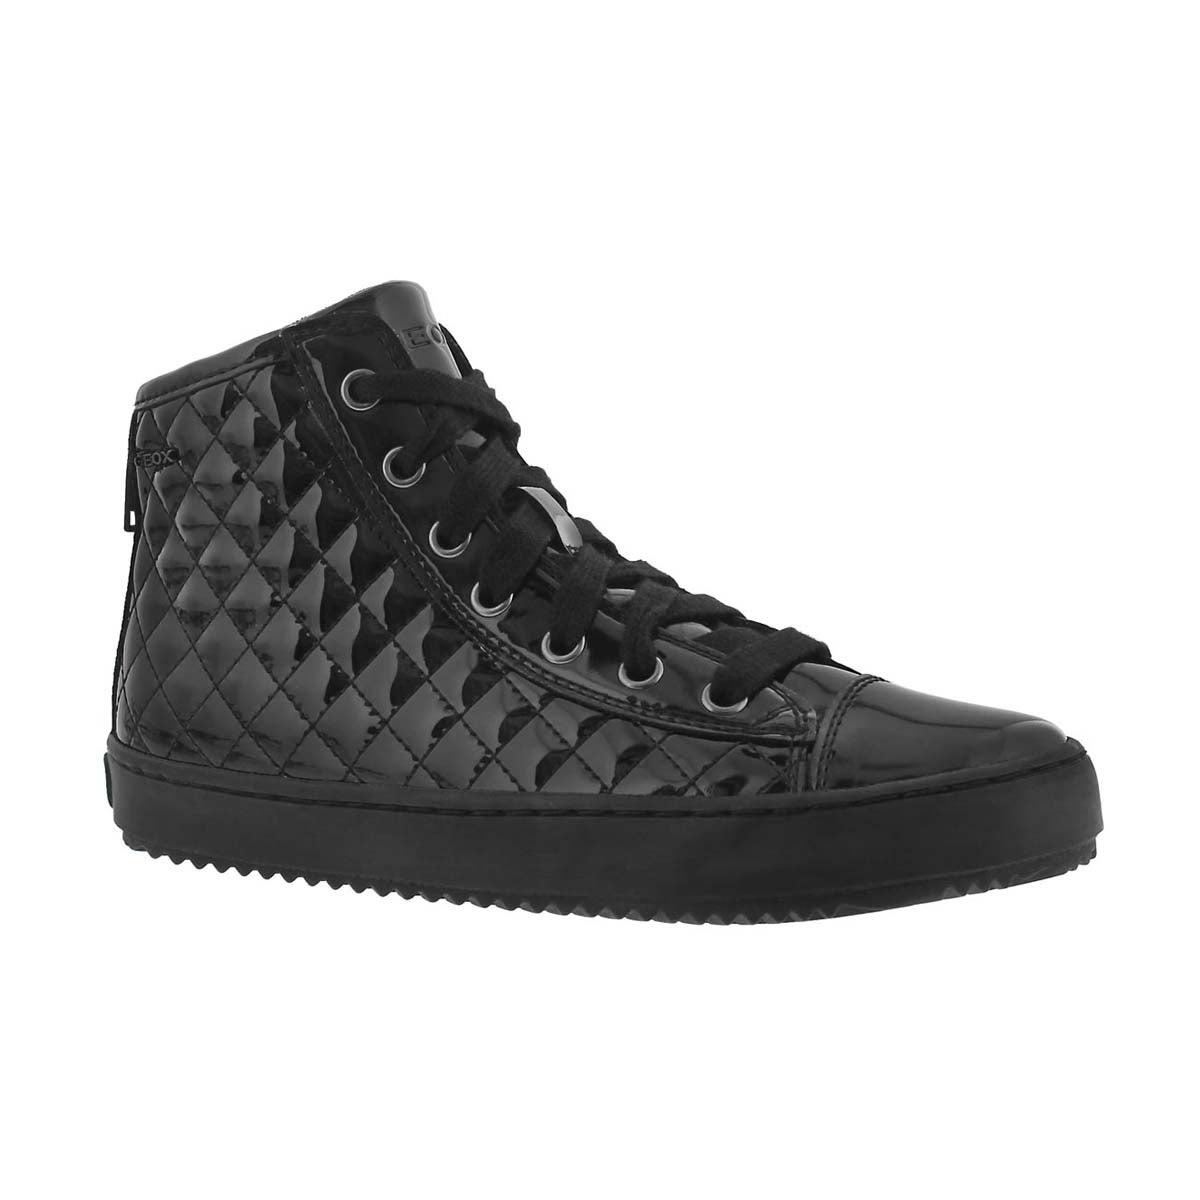 Girls' KALISPERA black high top sneakers